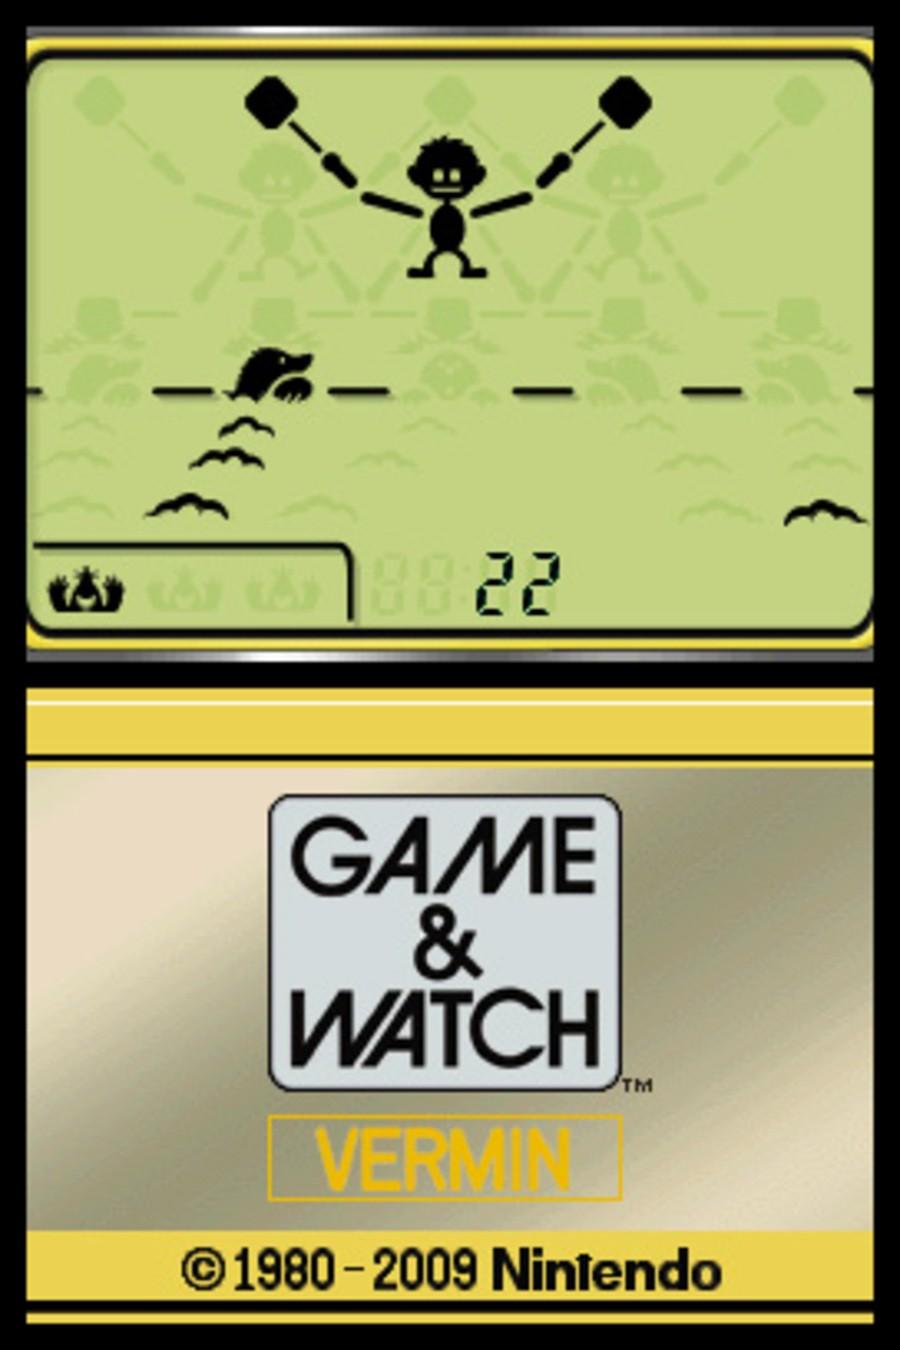 Game & Watch Vermin Screenshot